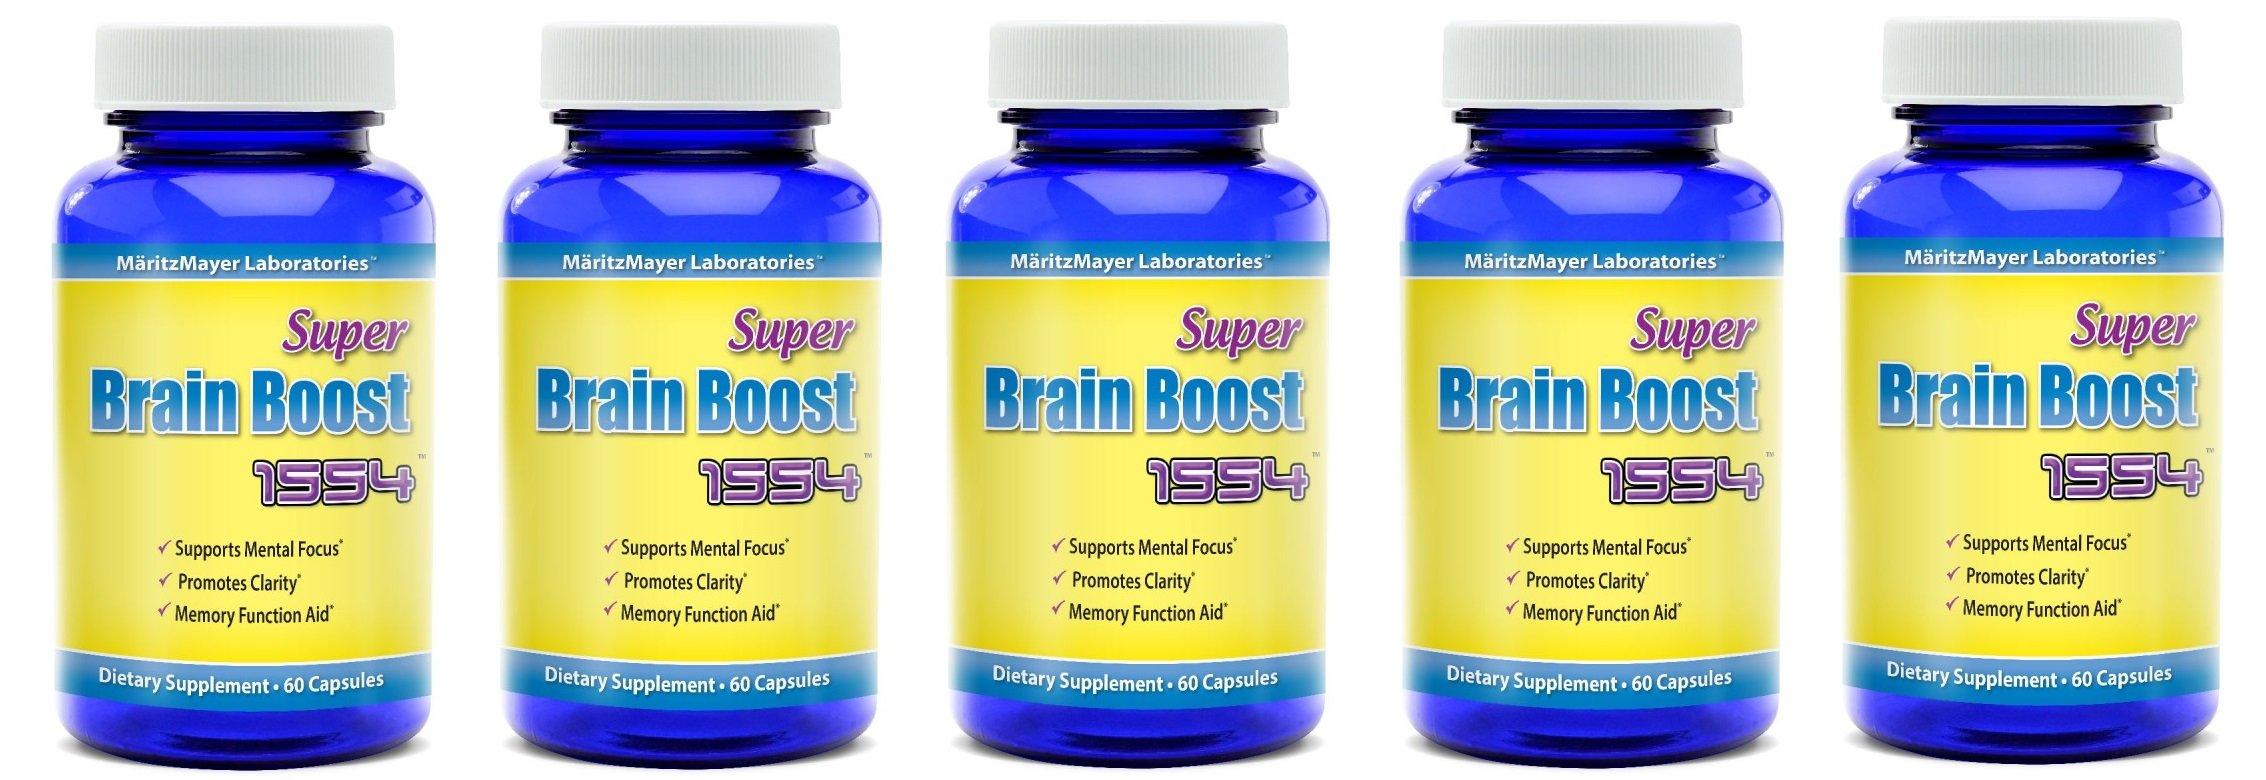 Super Brain Boost Nootropic 1554 Improve Focus Calrity Memory Concentration Contains Ginkgo Biloba St. John's Wort Bacopa Monniera DMAE 60 Capsules 5 Bottles